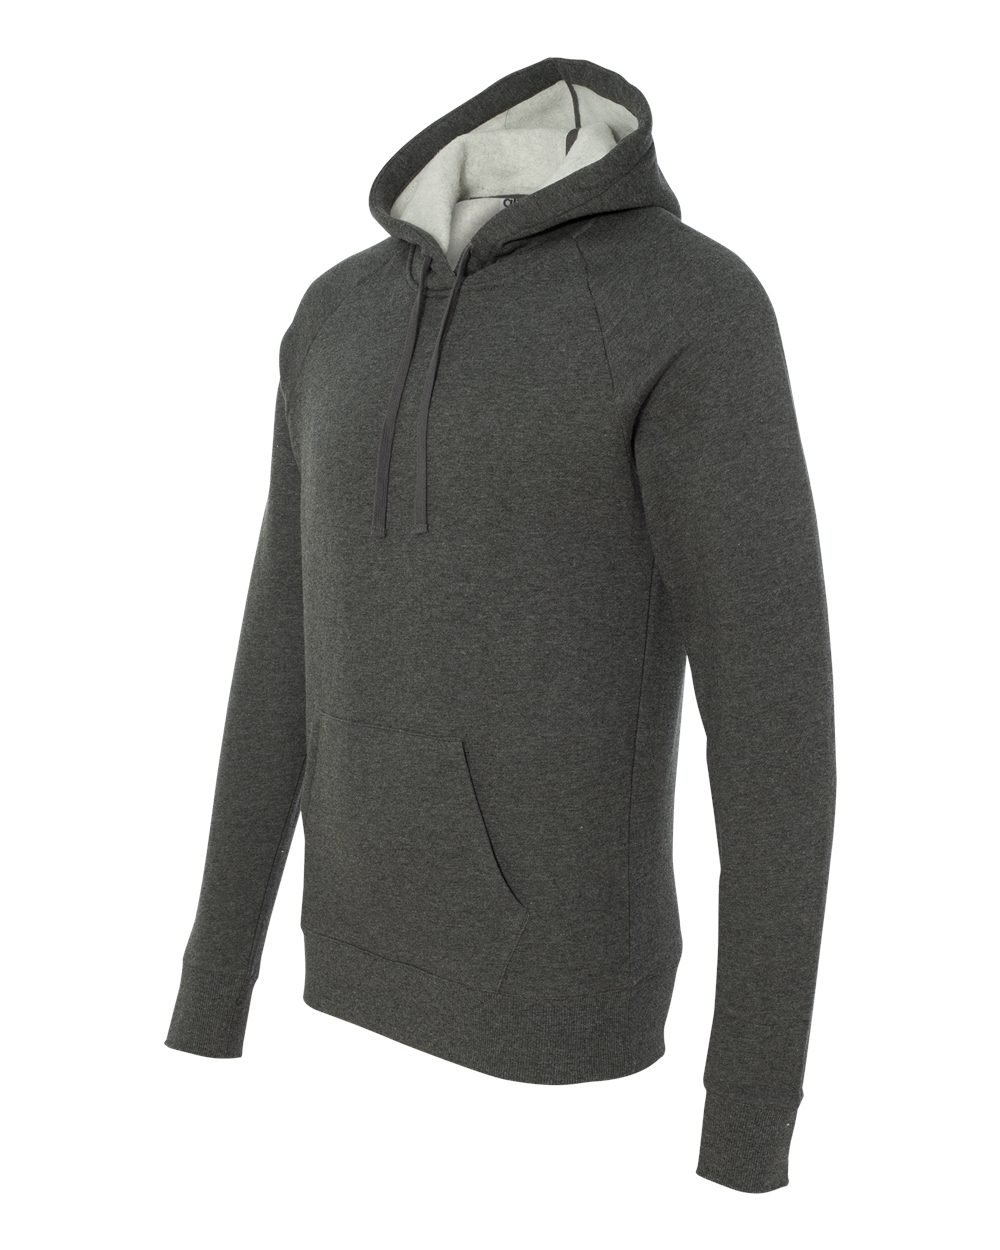 alo - Unisex Performance Fleece Hooded Pullover